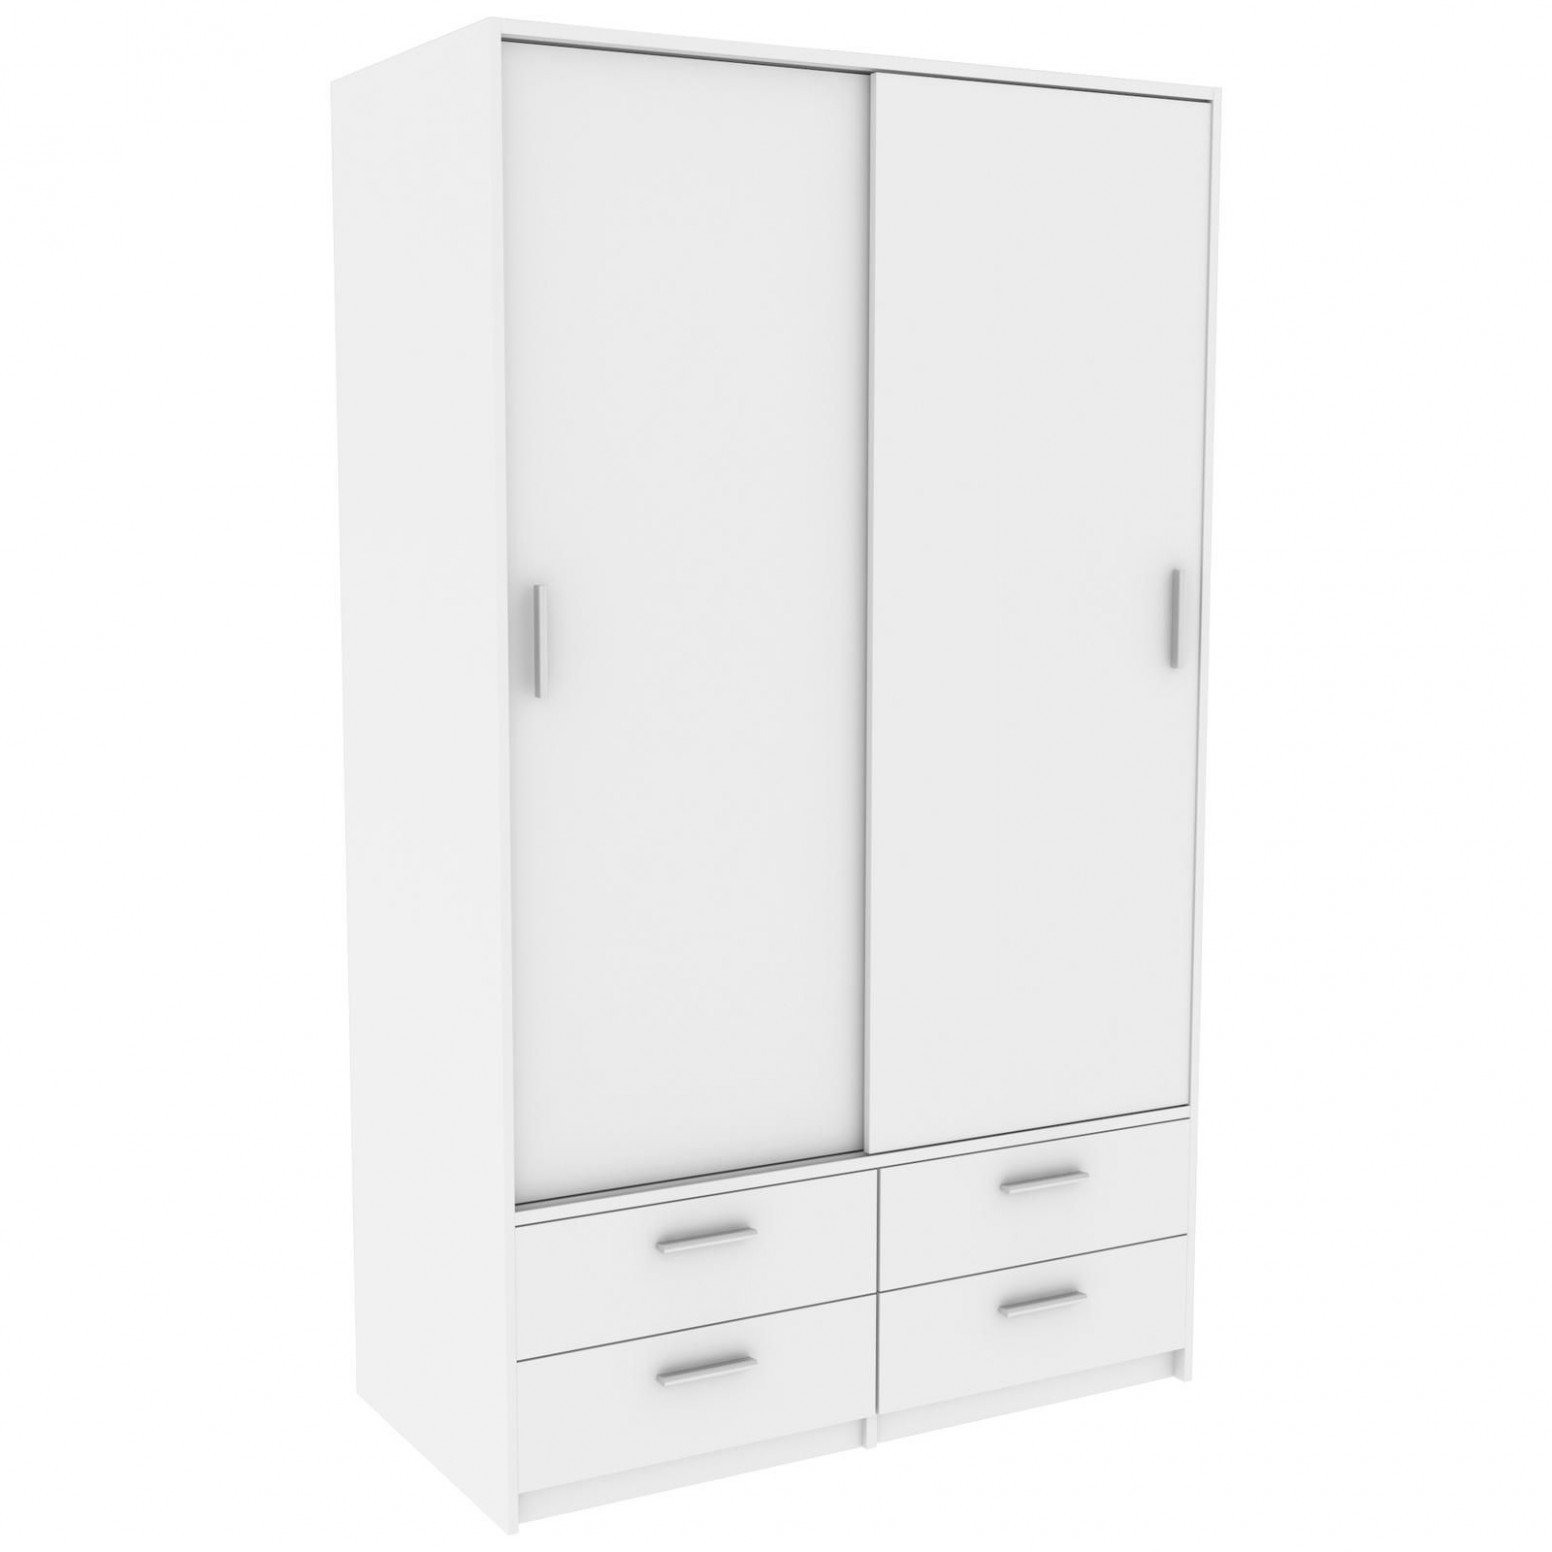 Bílá šatní skříň s posuvnými dveřmi Detroit | InHaus.cz